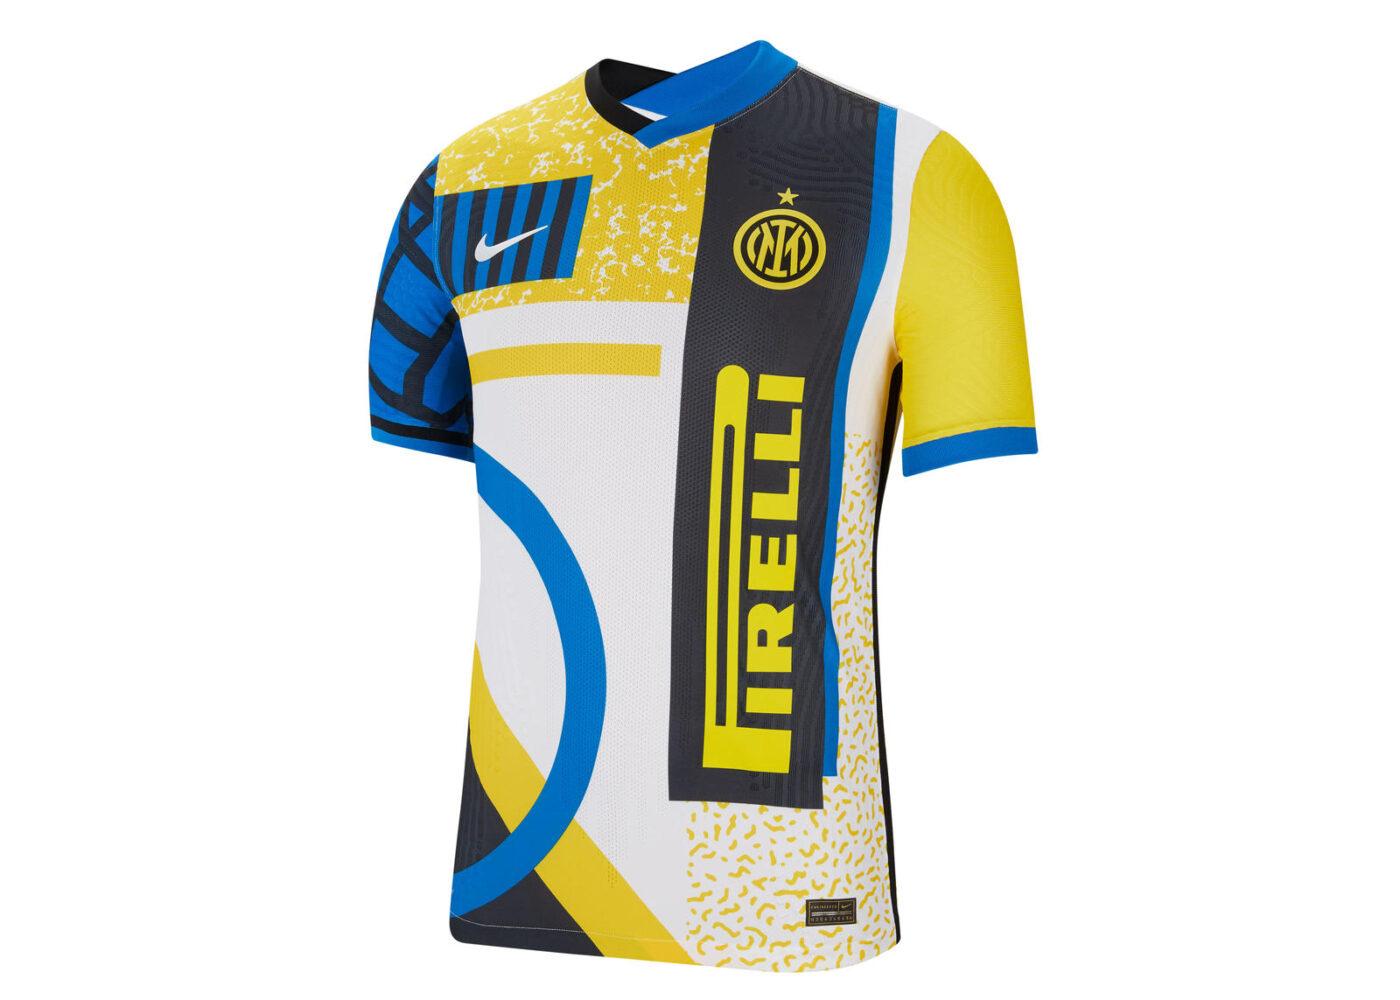 maillot fourth inter milan 2020 2021 nouveau logo